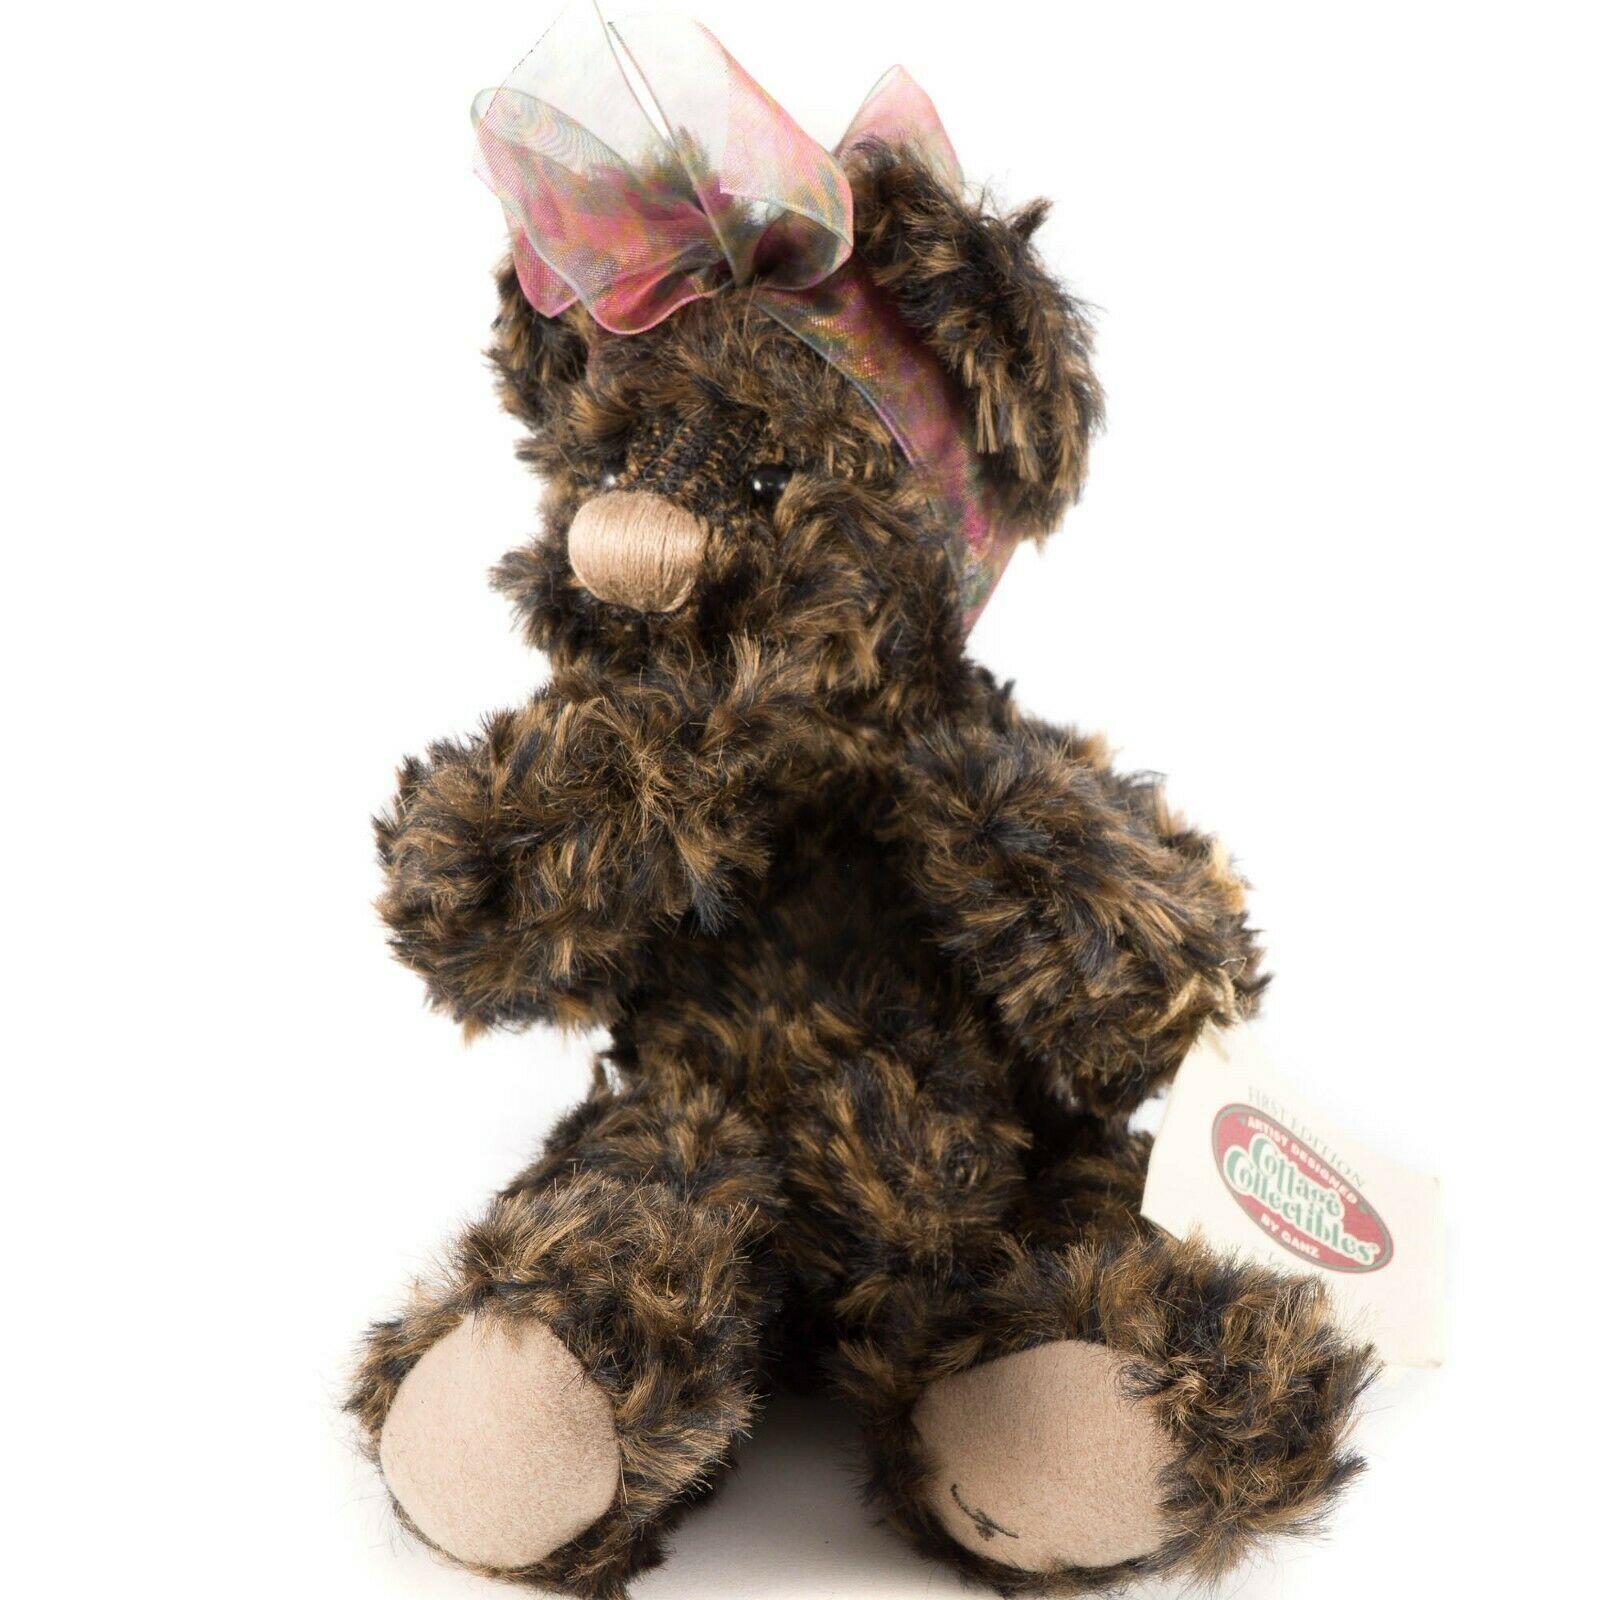 "Ganz Cottage Collectibles Lexi Teddy Bear 11"" First Edition Scarf Tag CC1801"